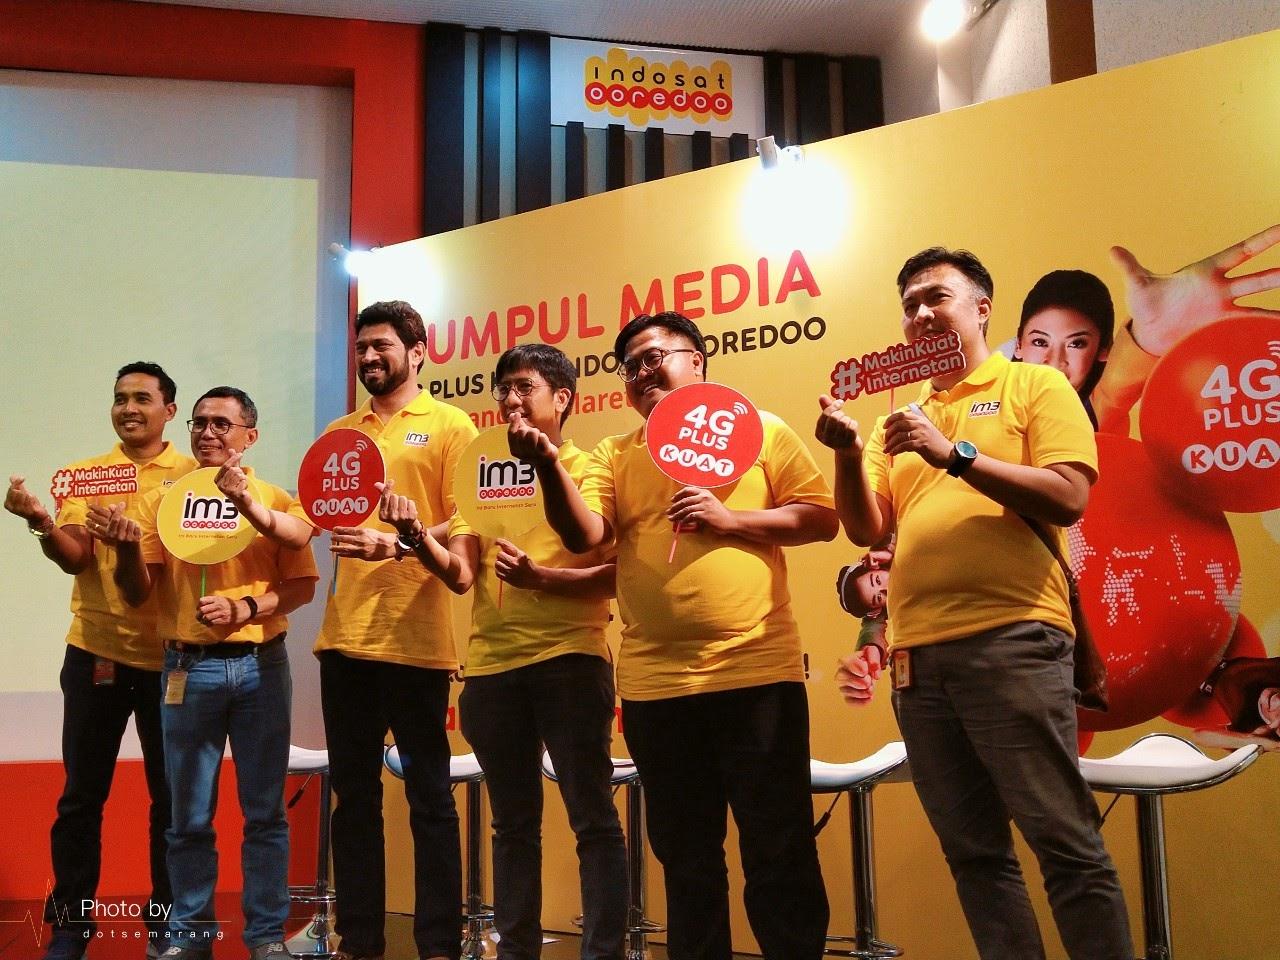 #MakinKuatInternetan : Indosat Ooredoo Kampanyekan Internetan Makin Kuat Dengan 4G Plus Kuat